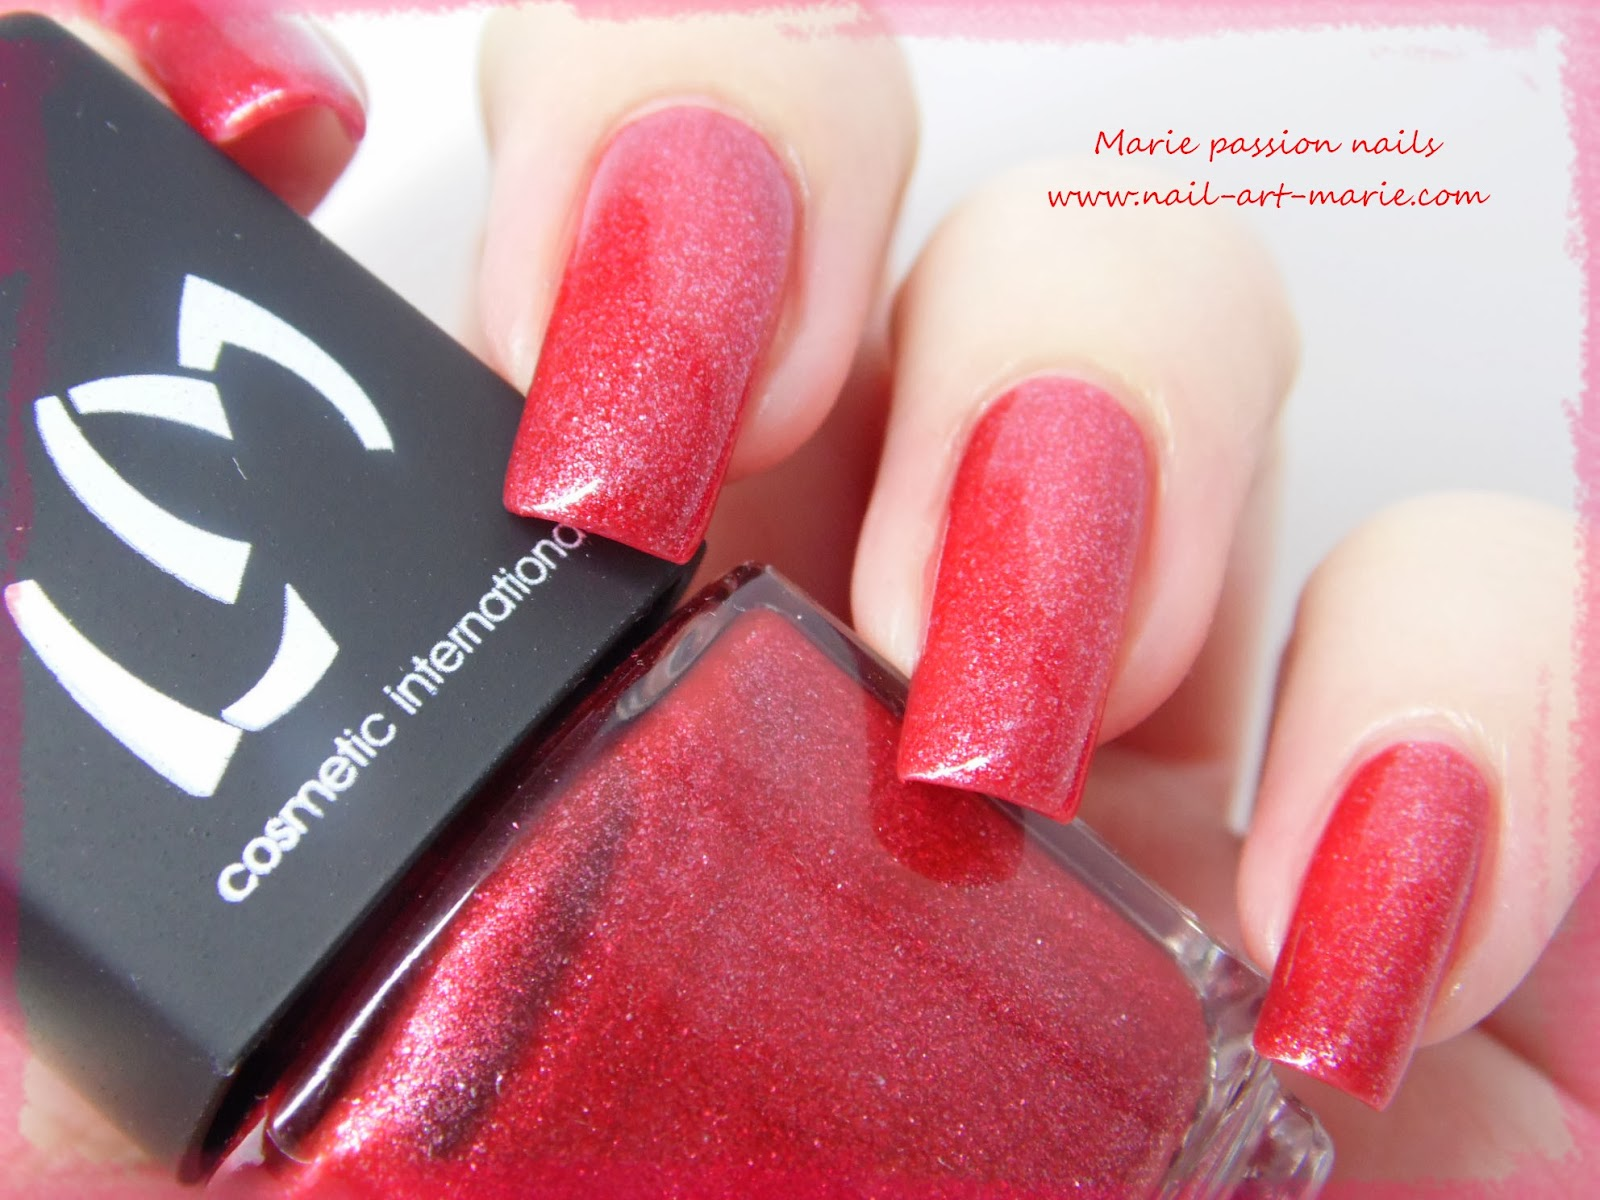 LM Cosmetic Gnaga8